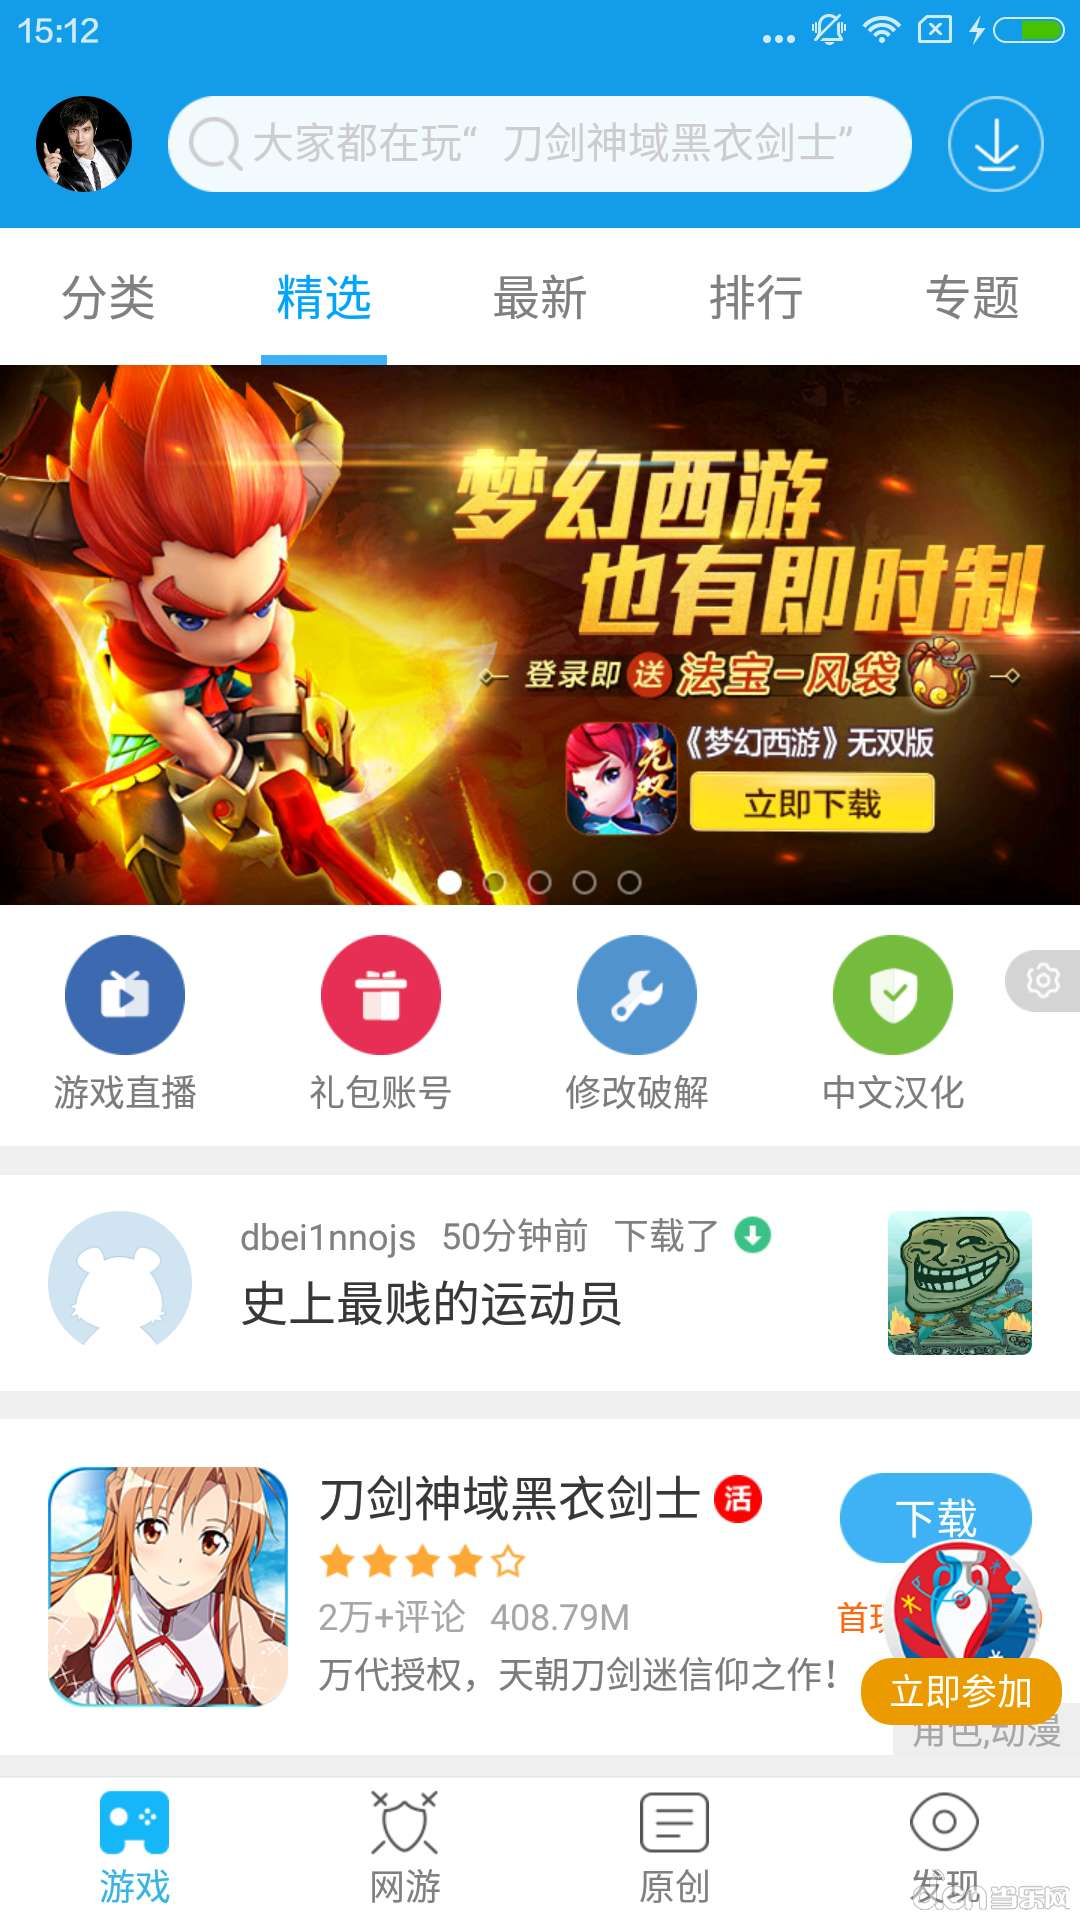 app背景素材橙红 渐变